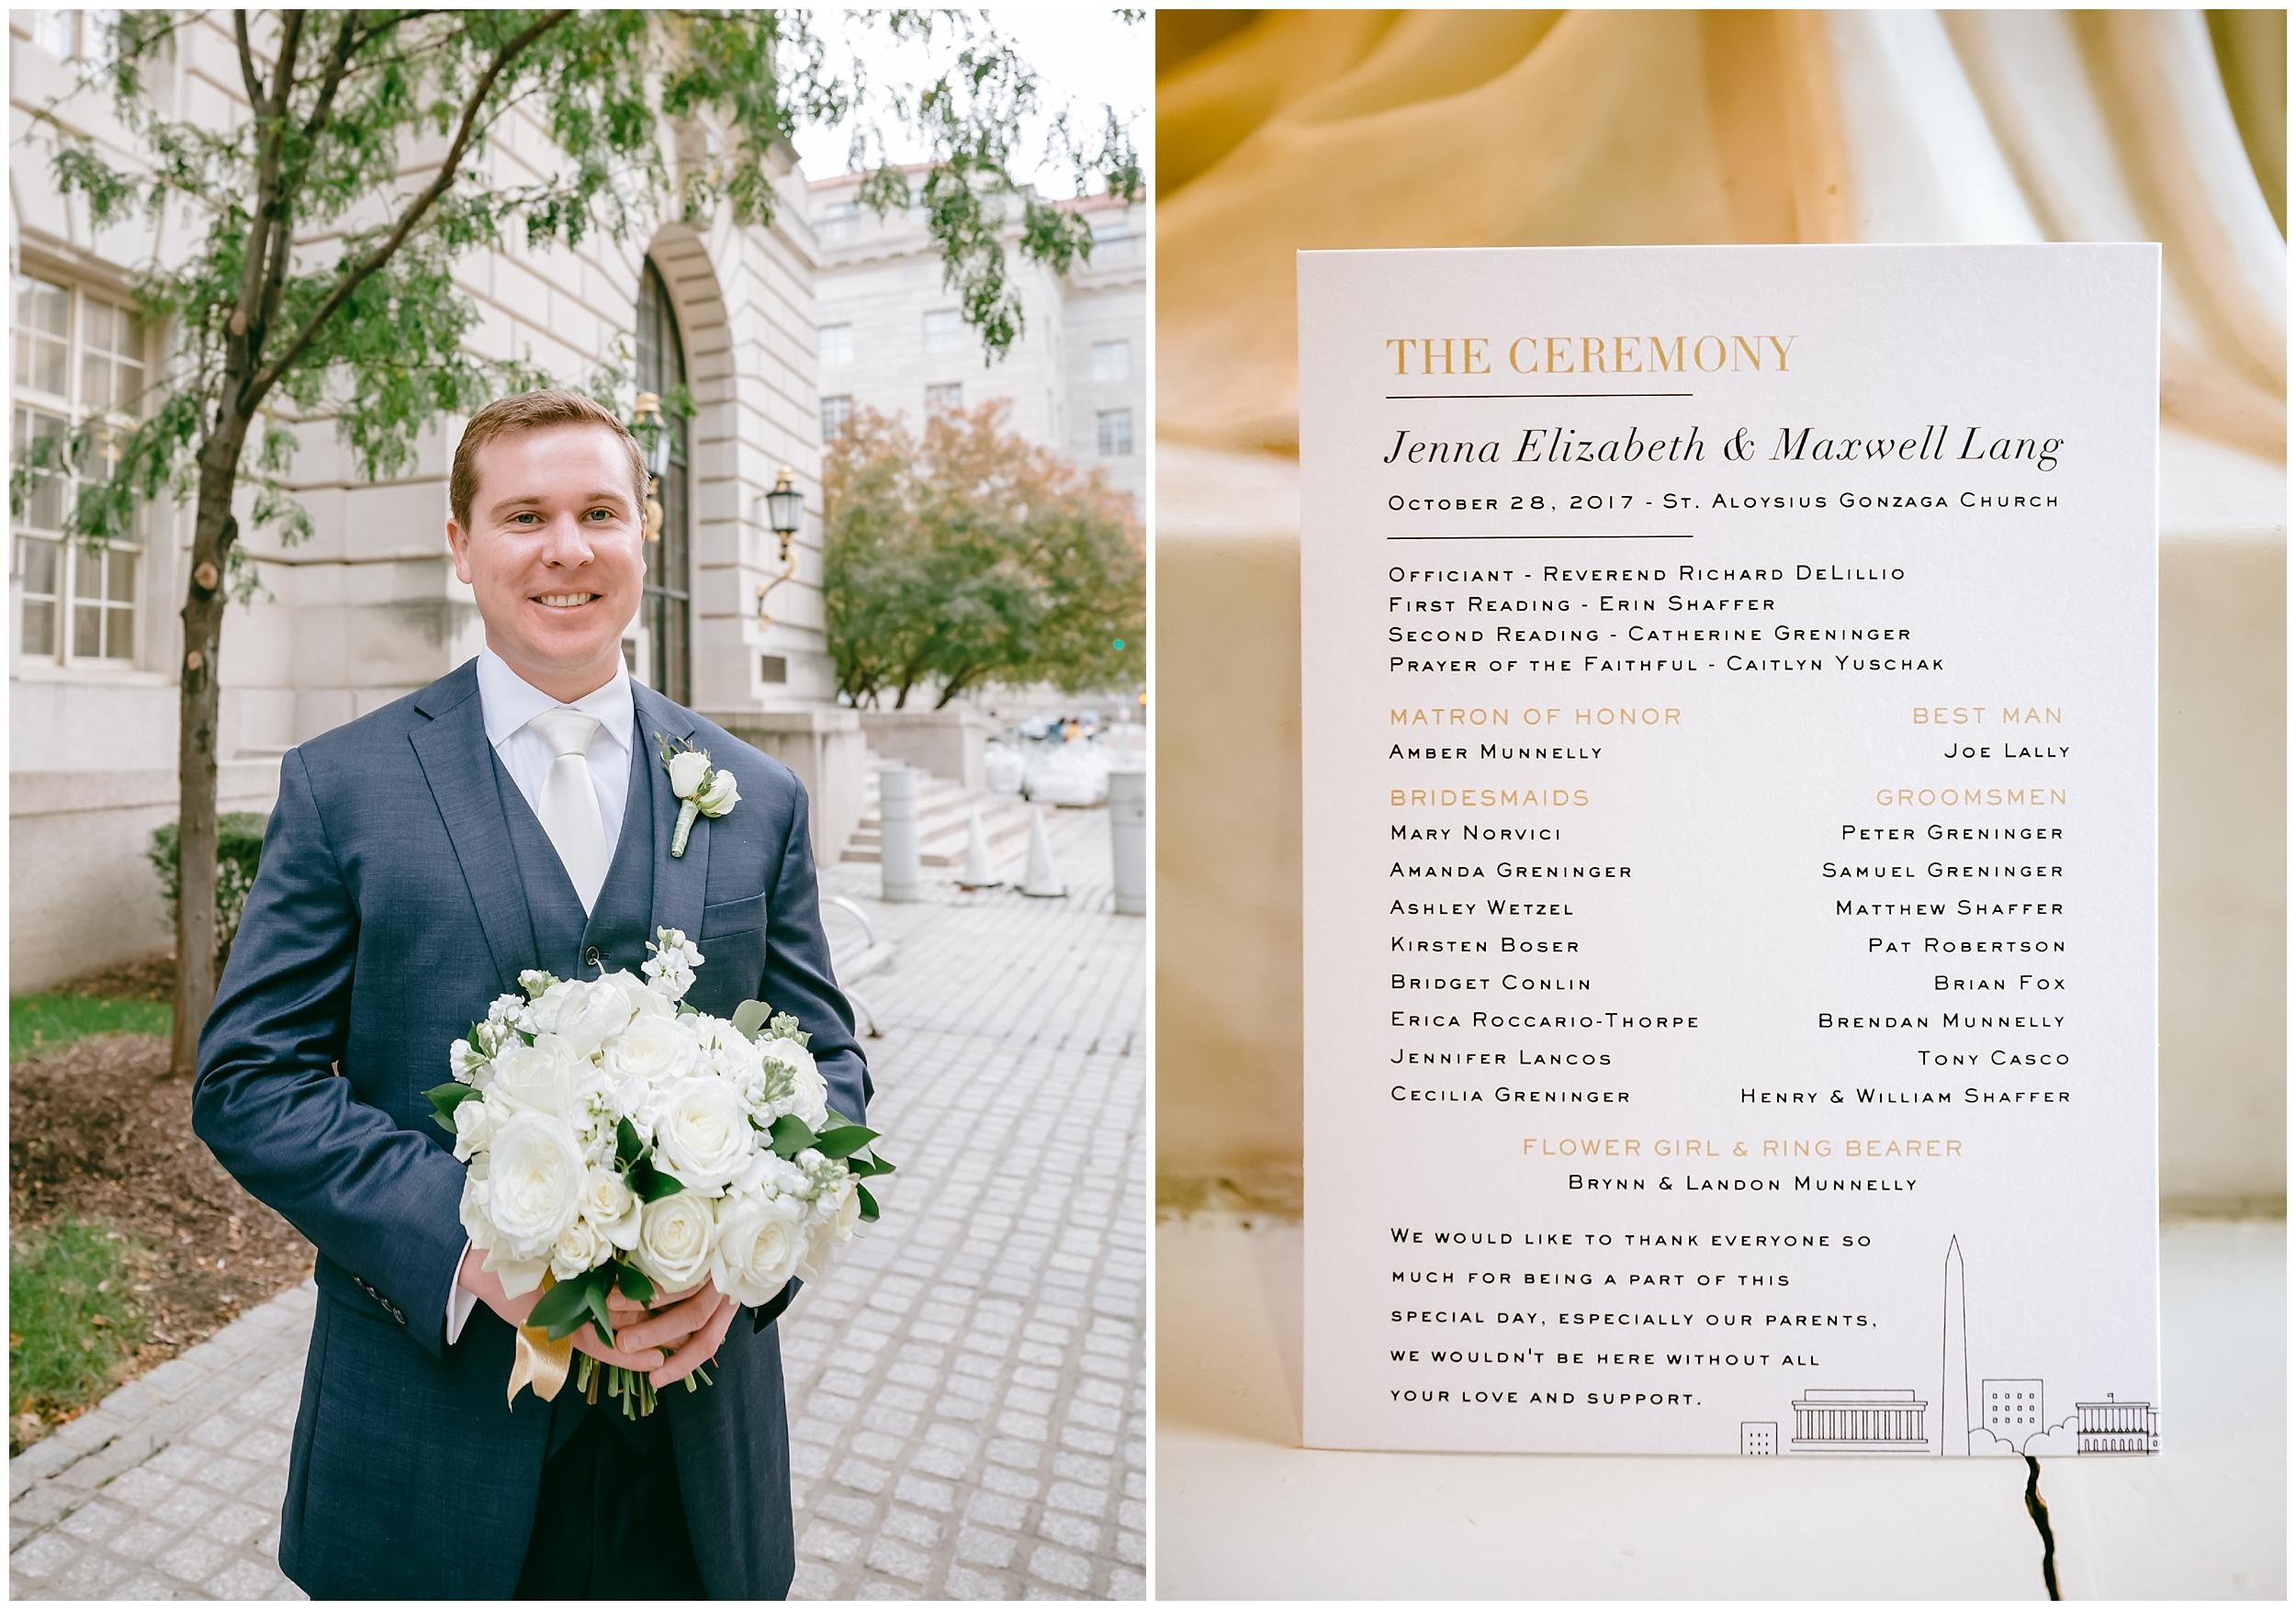 wedding-groom-bouquet-ceremony-program-washington-dc-photographer